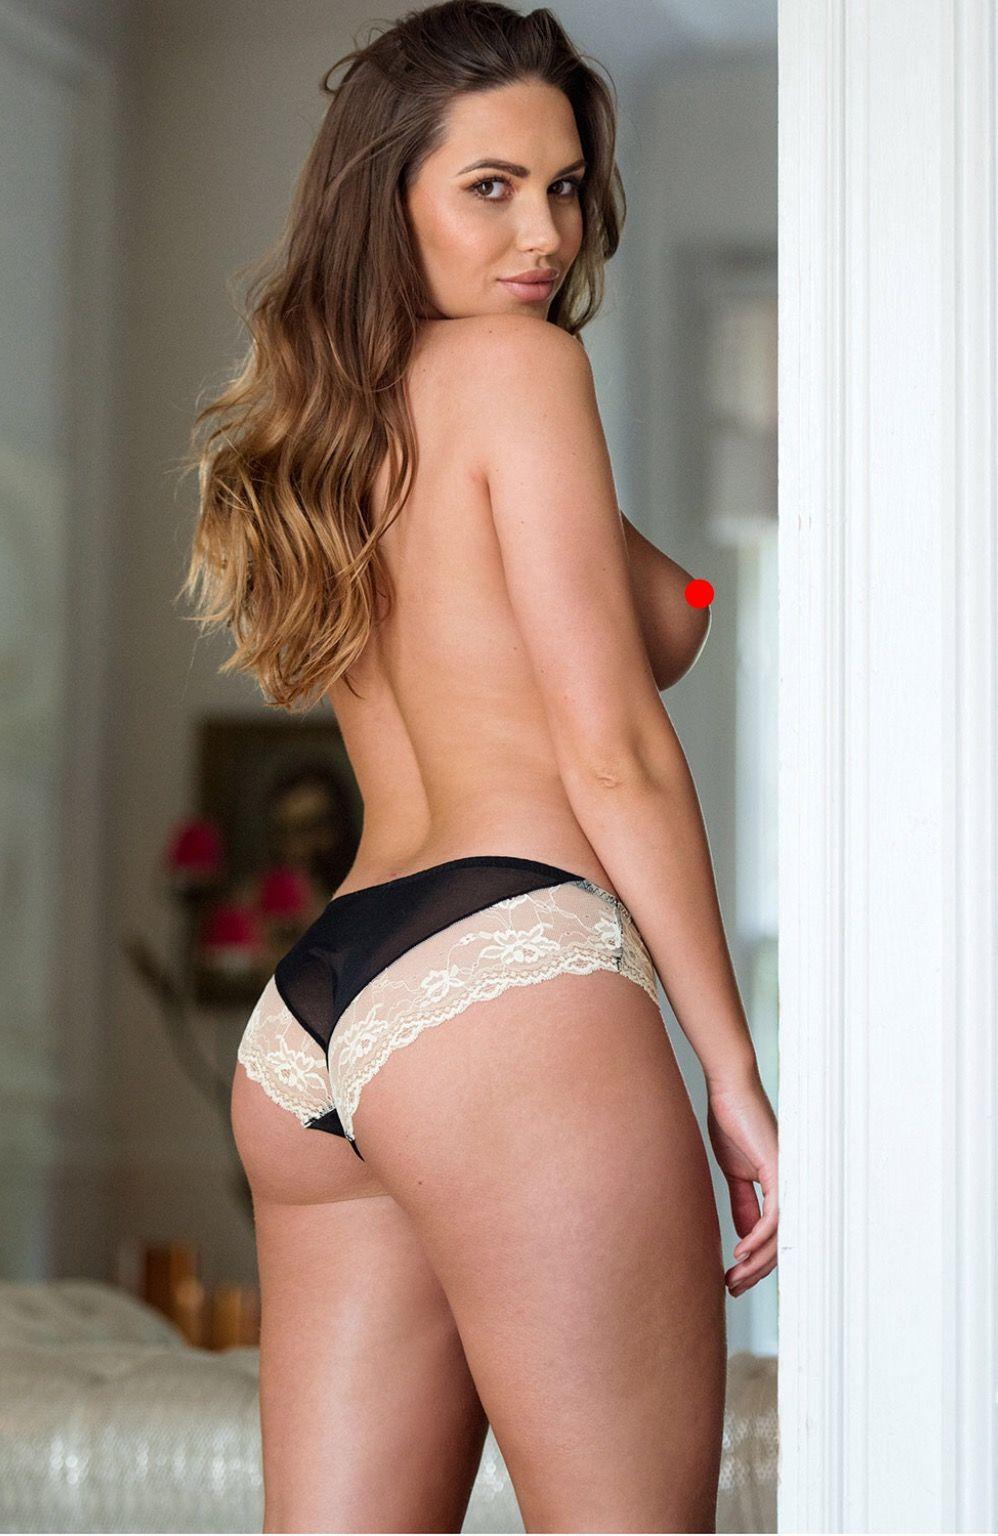 nudes (41 photo), Ass Celebrity photos